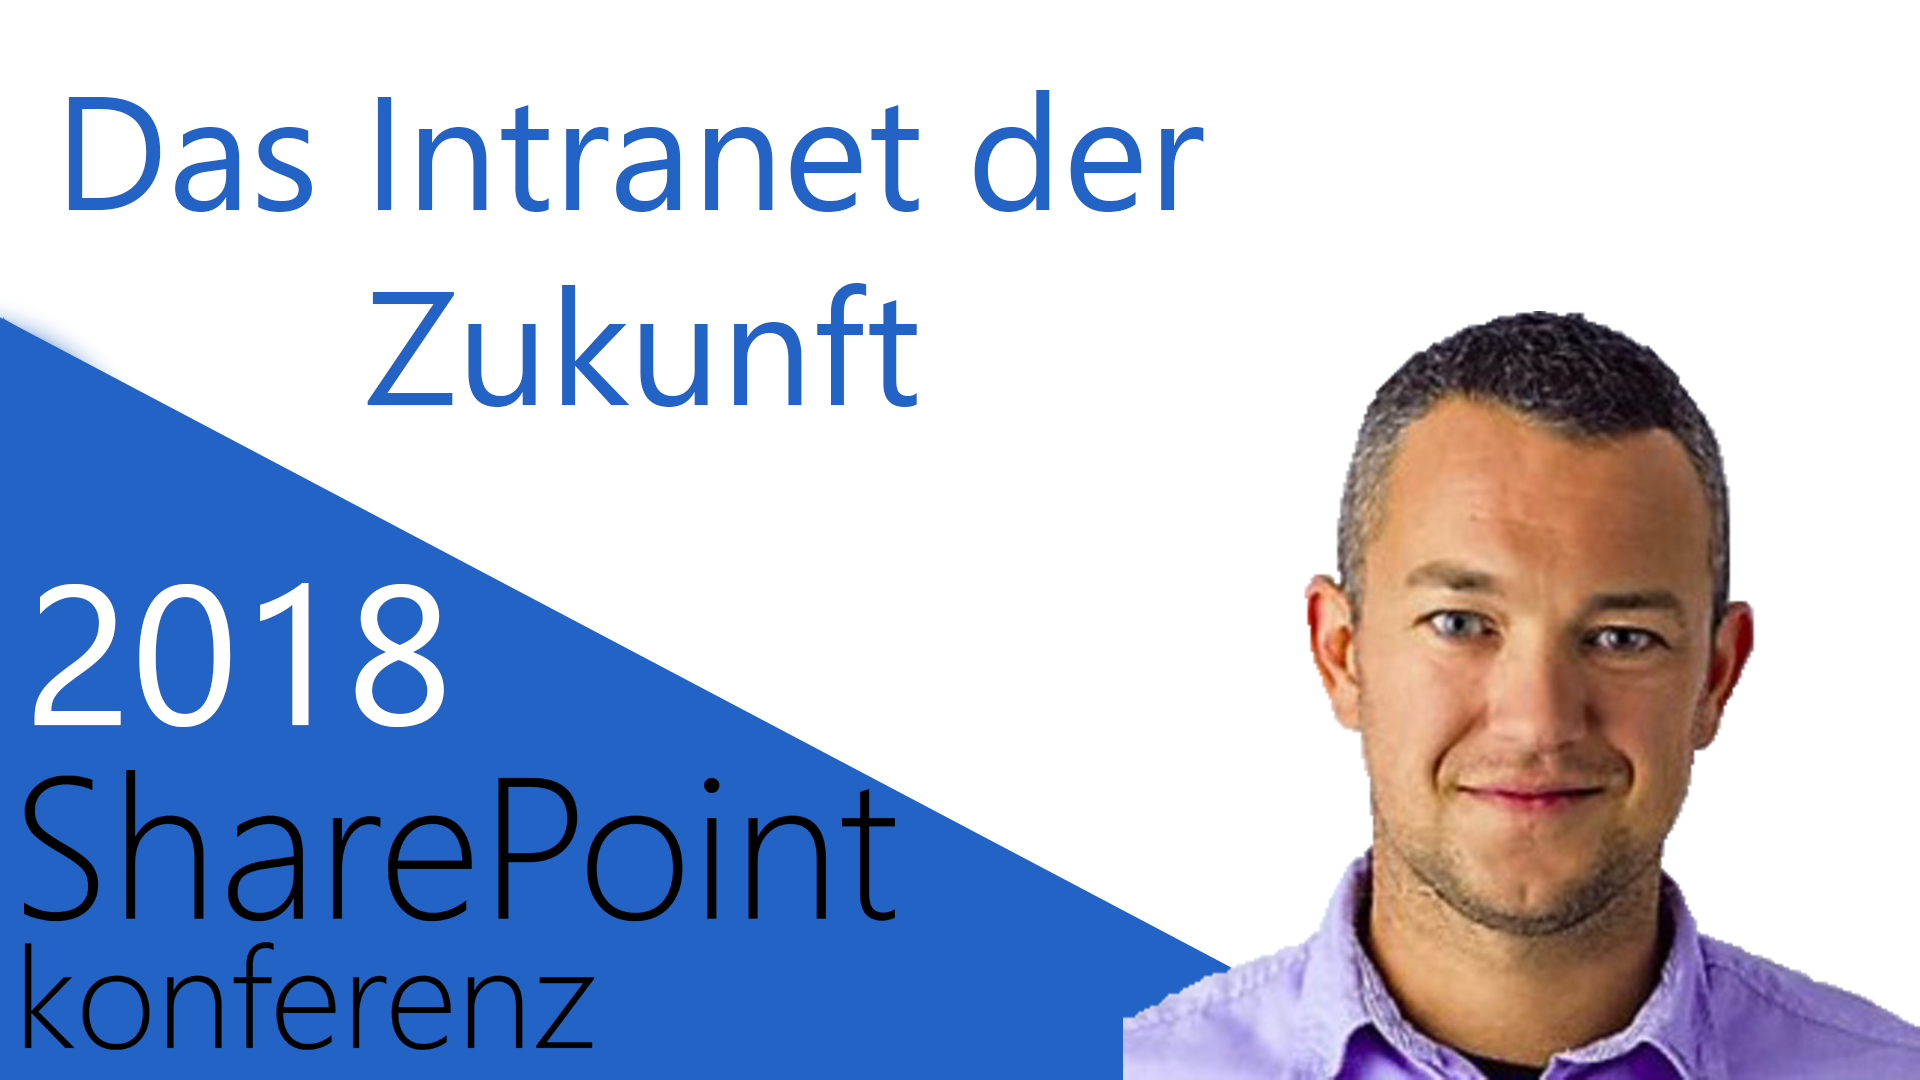 2018/SharePointKonferenz/DasIntranetderZukunft